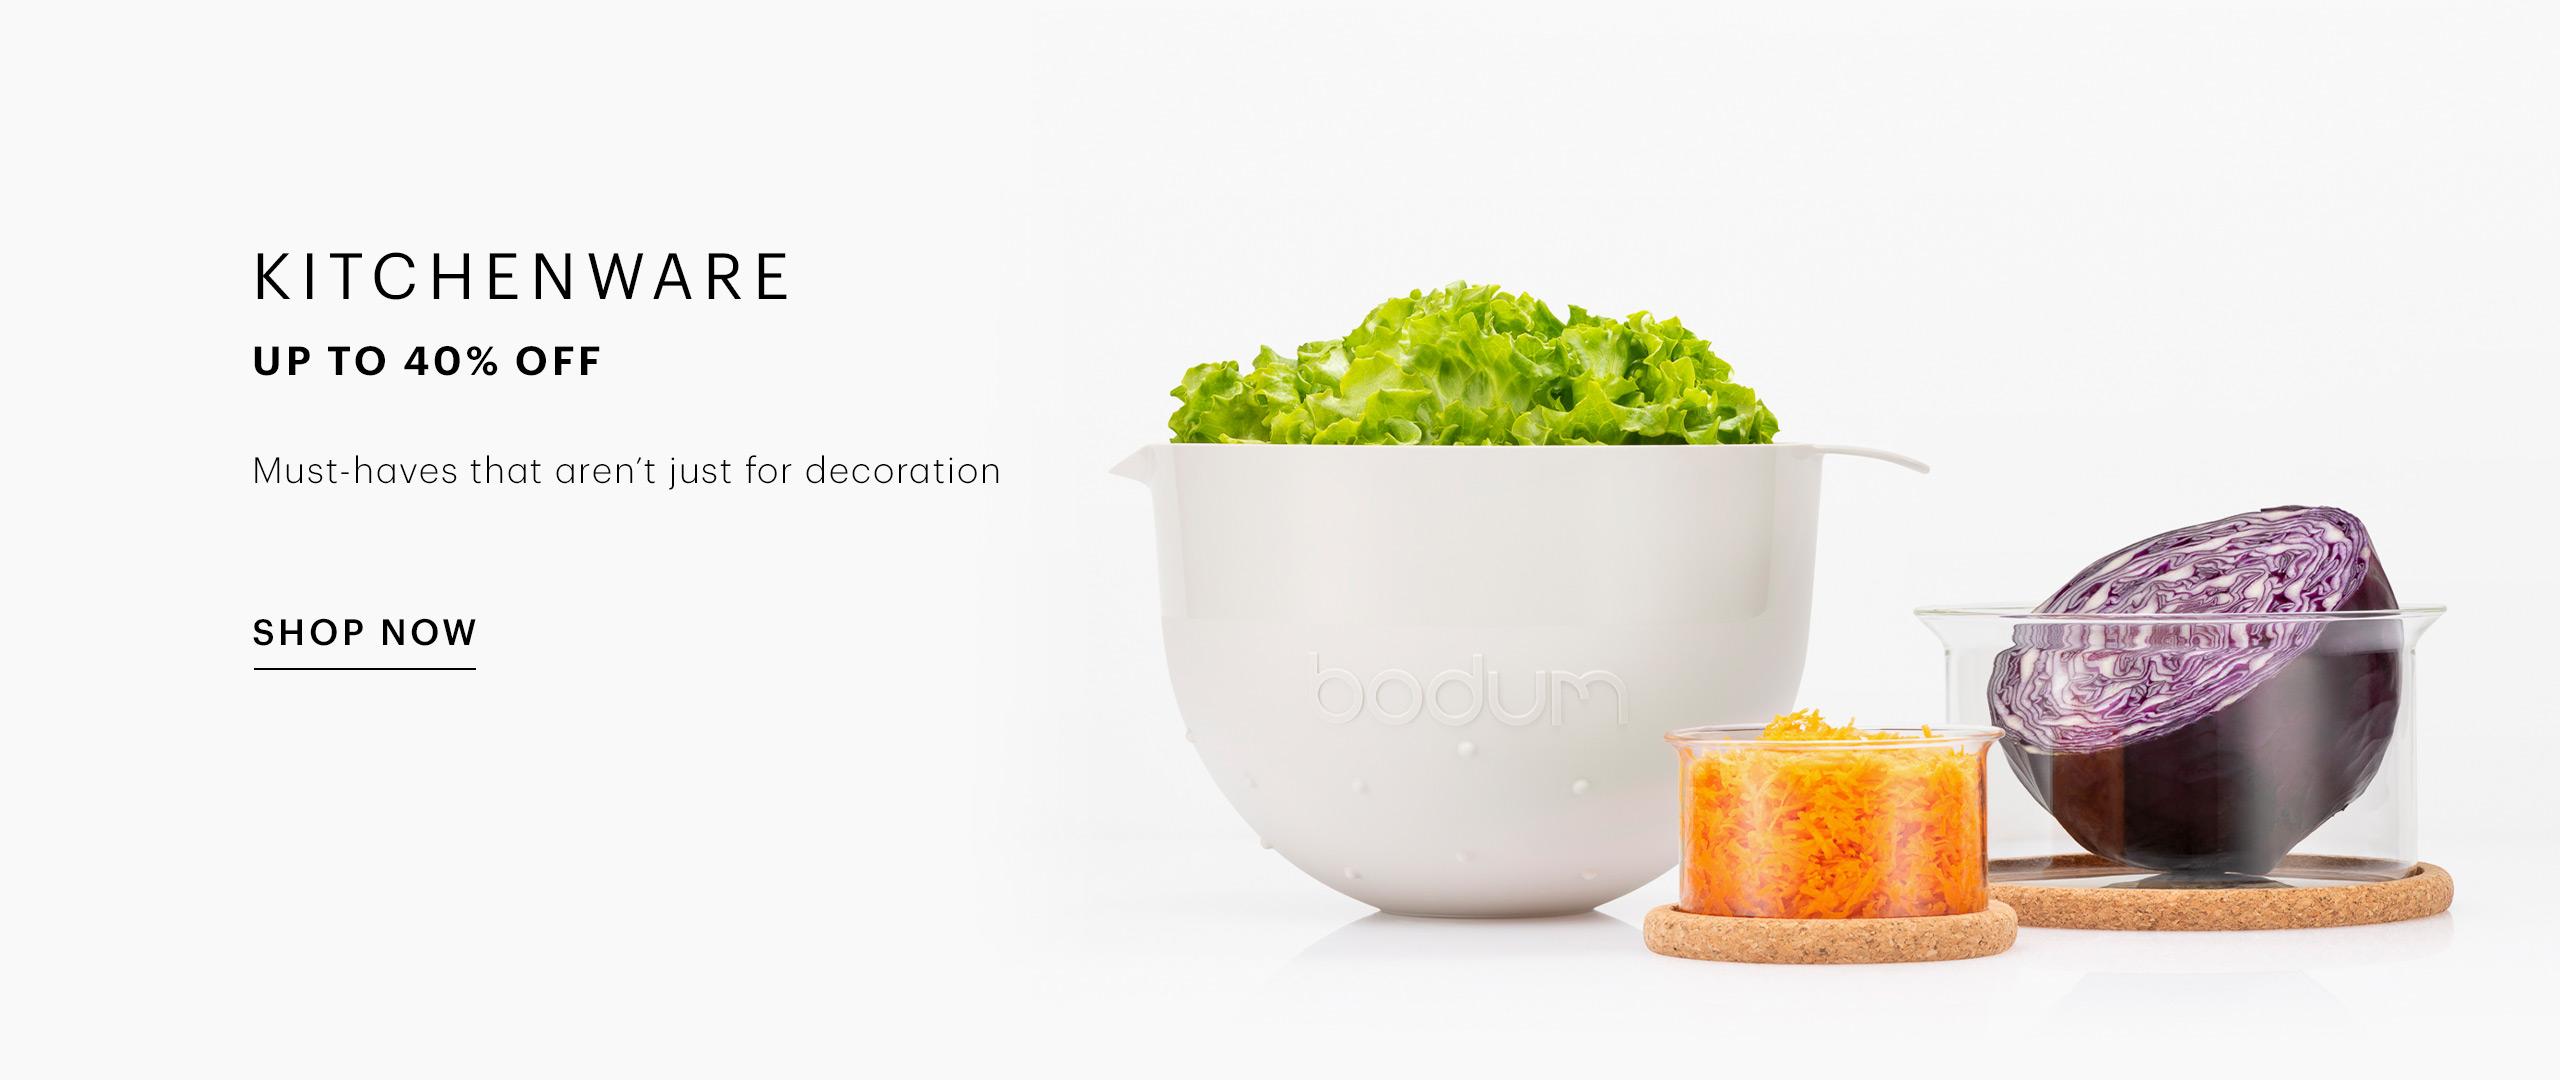 BEU [UK/IE] - Kitchenware